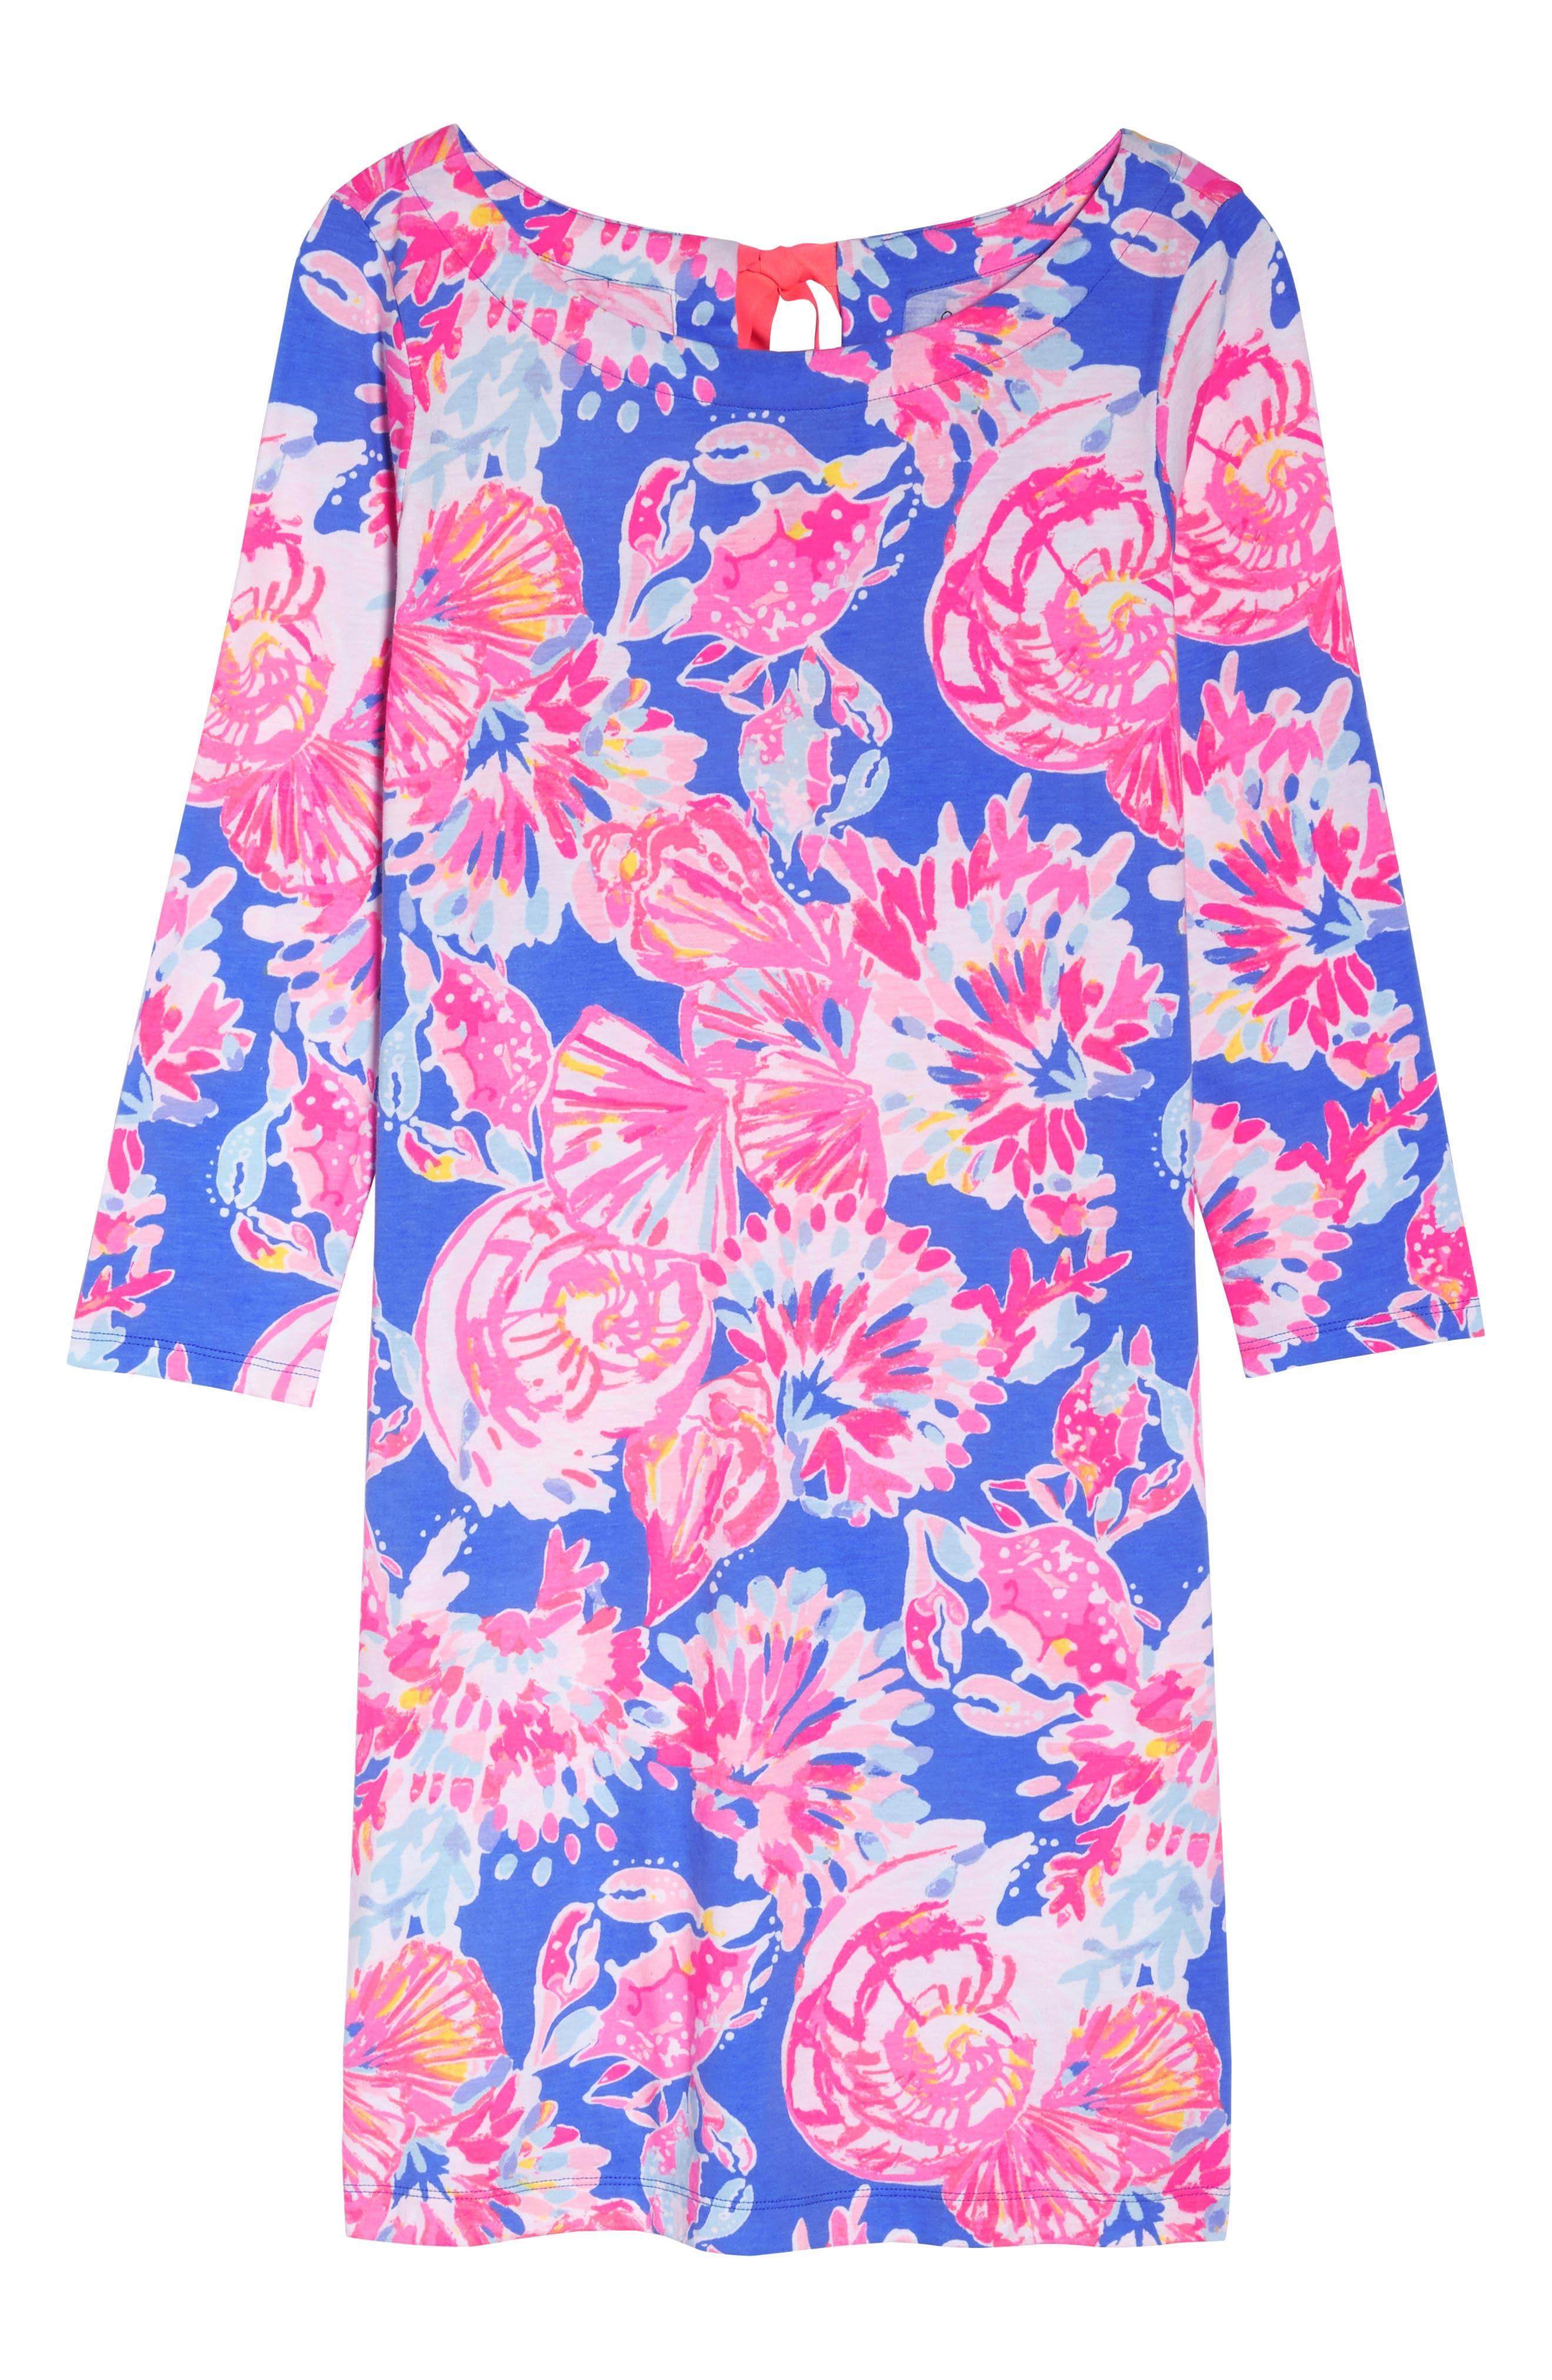 Noelle Floral Shift Dress,                             Alternate thumbnail 7, color,                             650